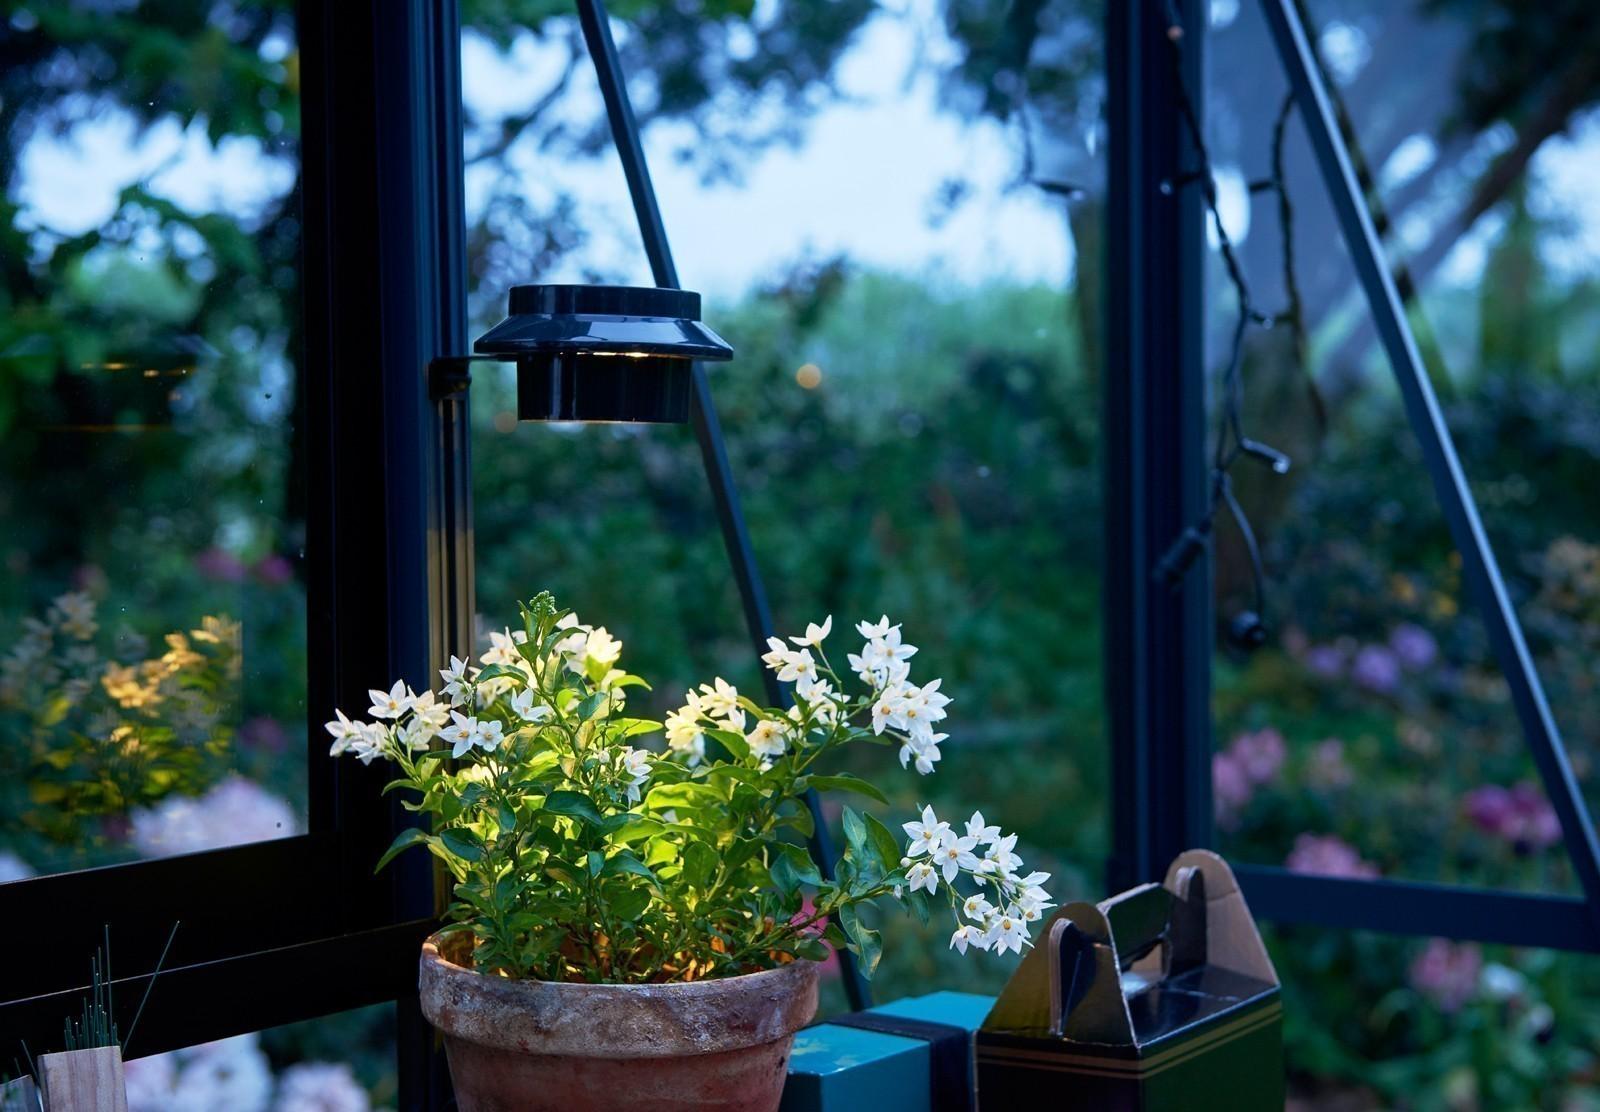 Juliana LED Solar Lampe für Gewächshäuser Bild 2